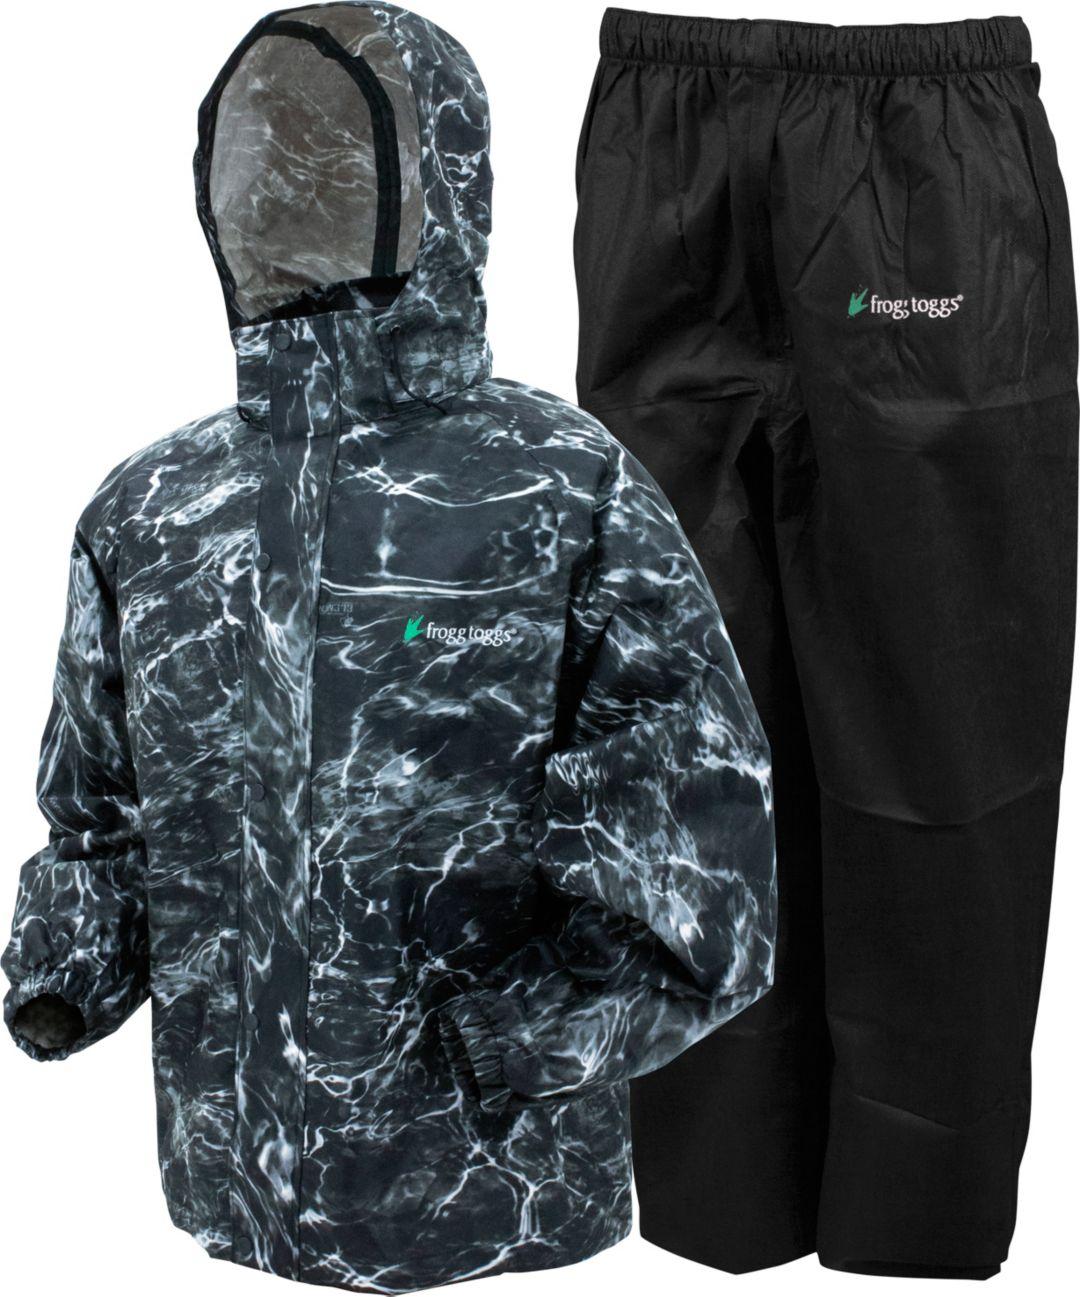 055331bef1a34 frogg toggs Men's All Sports Rain & Wind Suit | Field & Stream